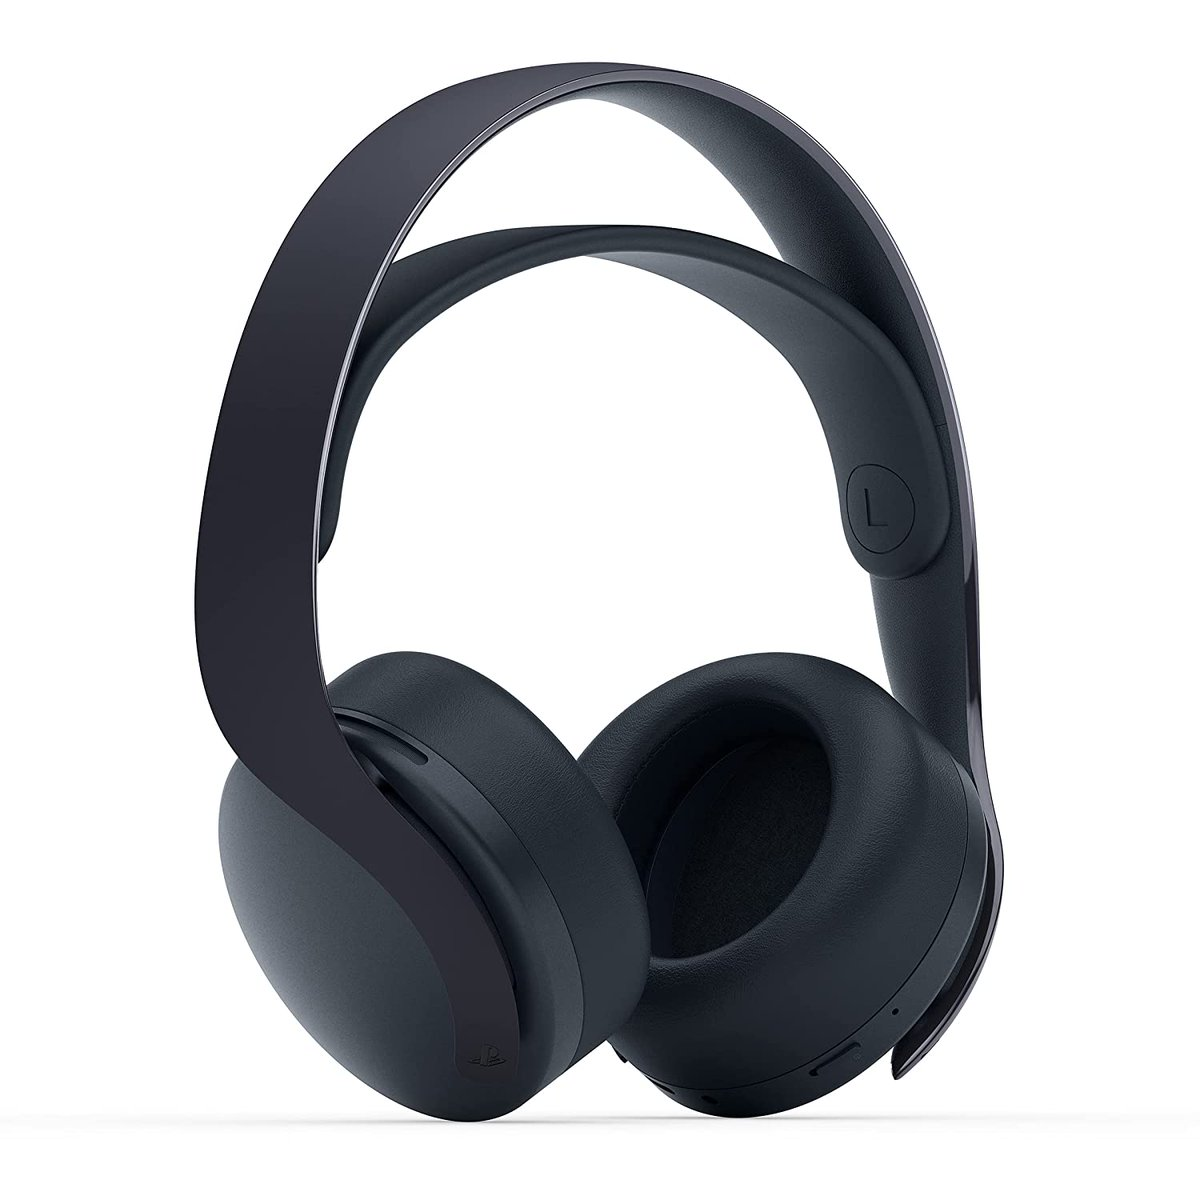 PlayStation PULSE 3D Wireless Headset Midnight Black Pre-Order  Link -  9